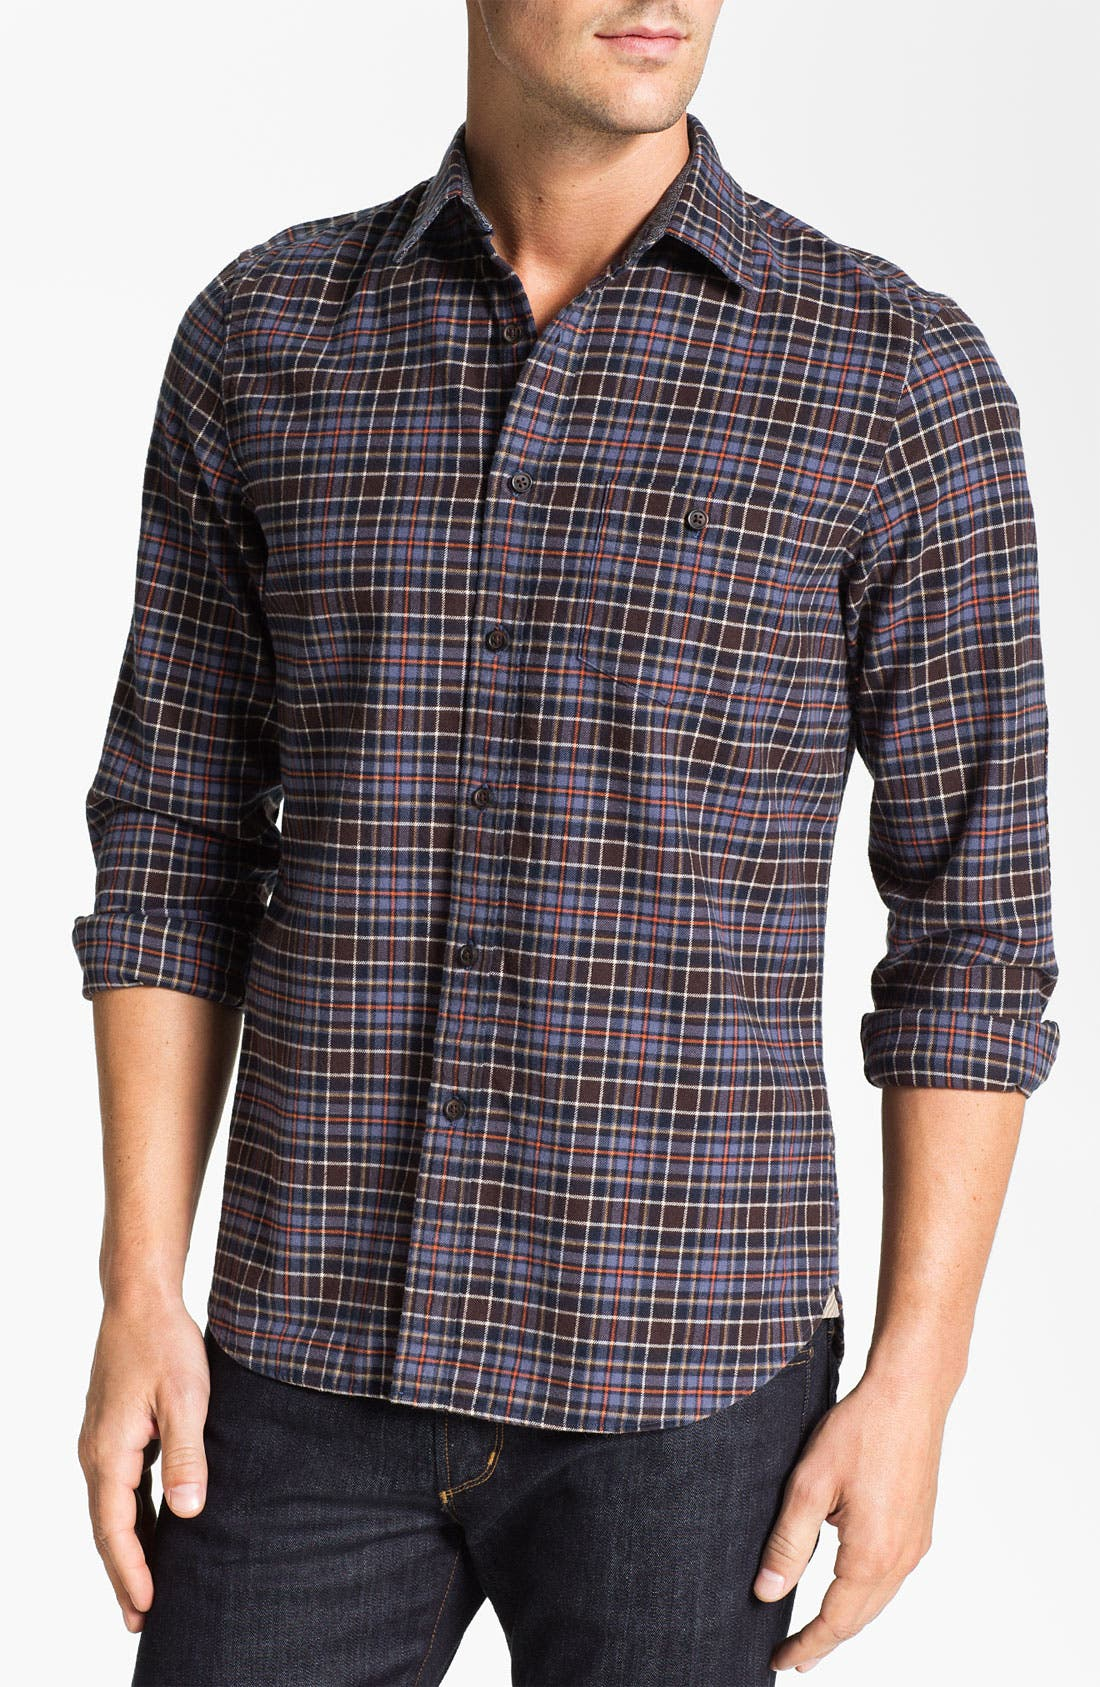 Alternate Image 1 Selected - Wallin & Bros. Plaid Flannel Shirt